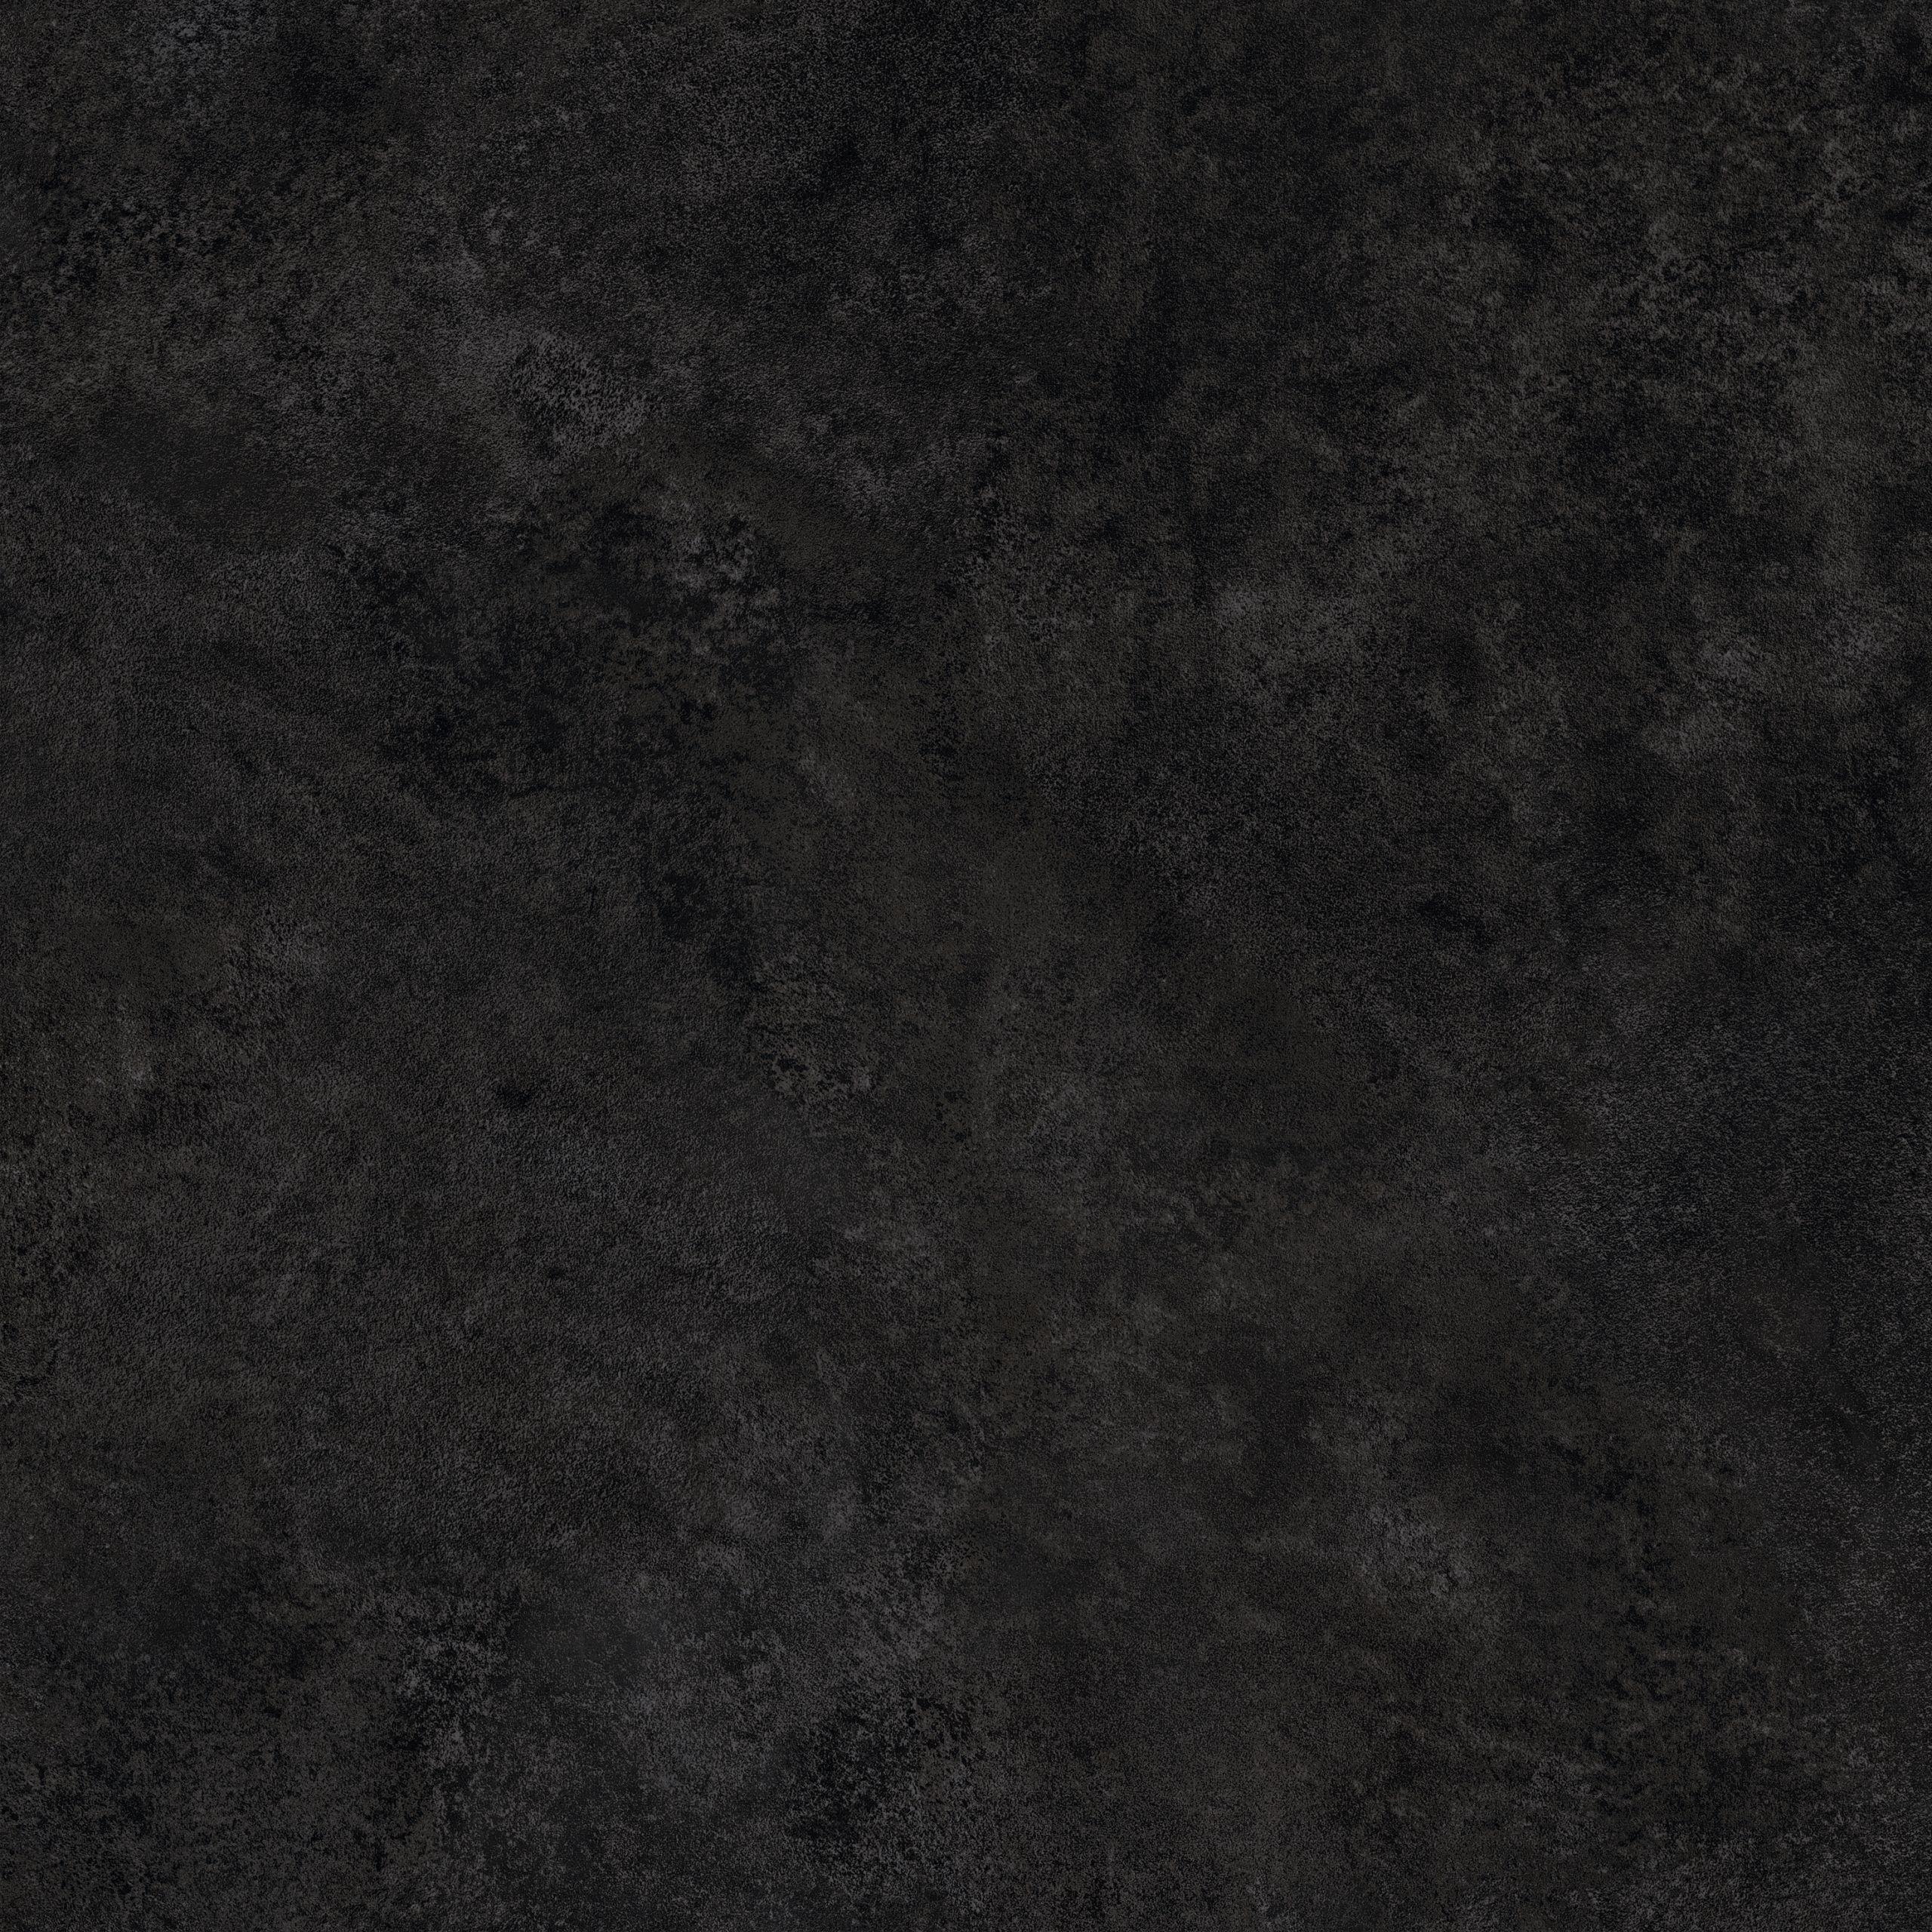 Panele winylowe LVT modulari ® STONE DRYBACK 32,9 x 65,9 cm 46972